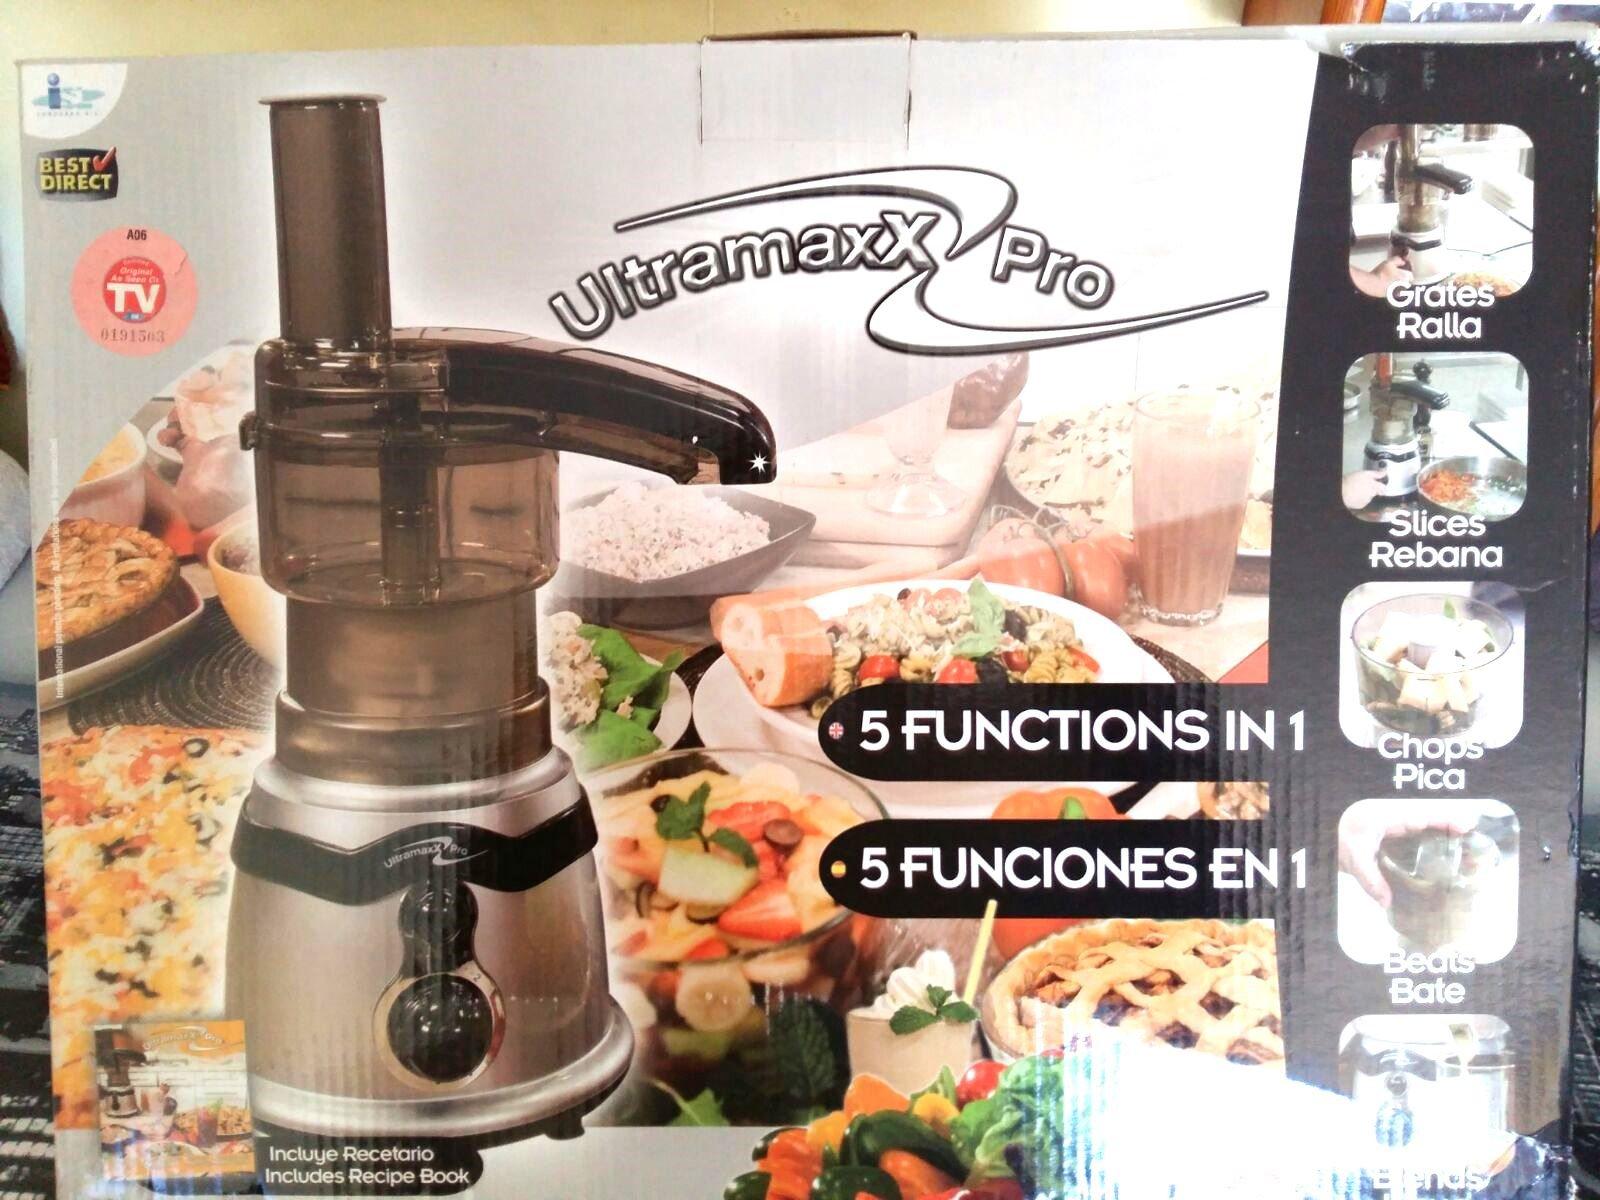 Ultramaxx Pro robot de cocina 5 funciones OFERTA: Amazon.es: Hogar